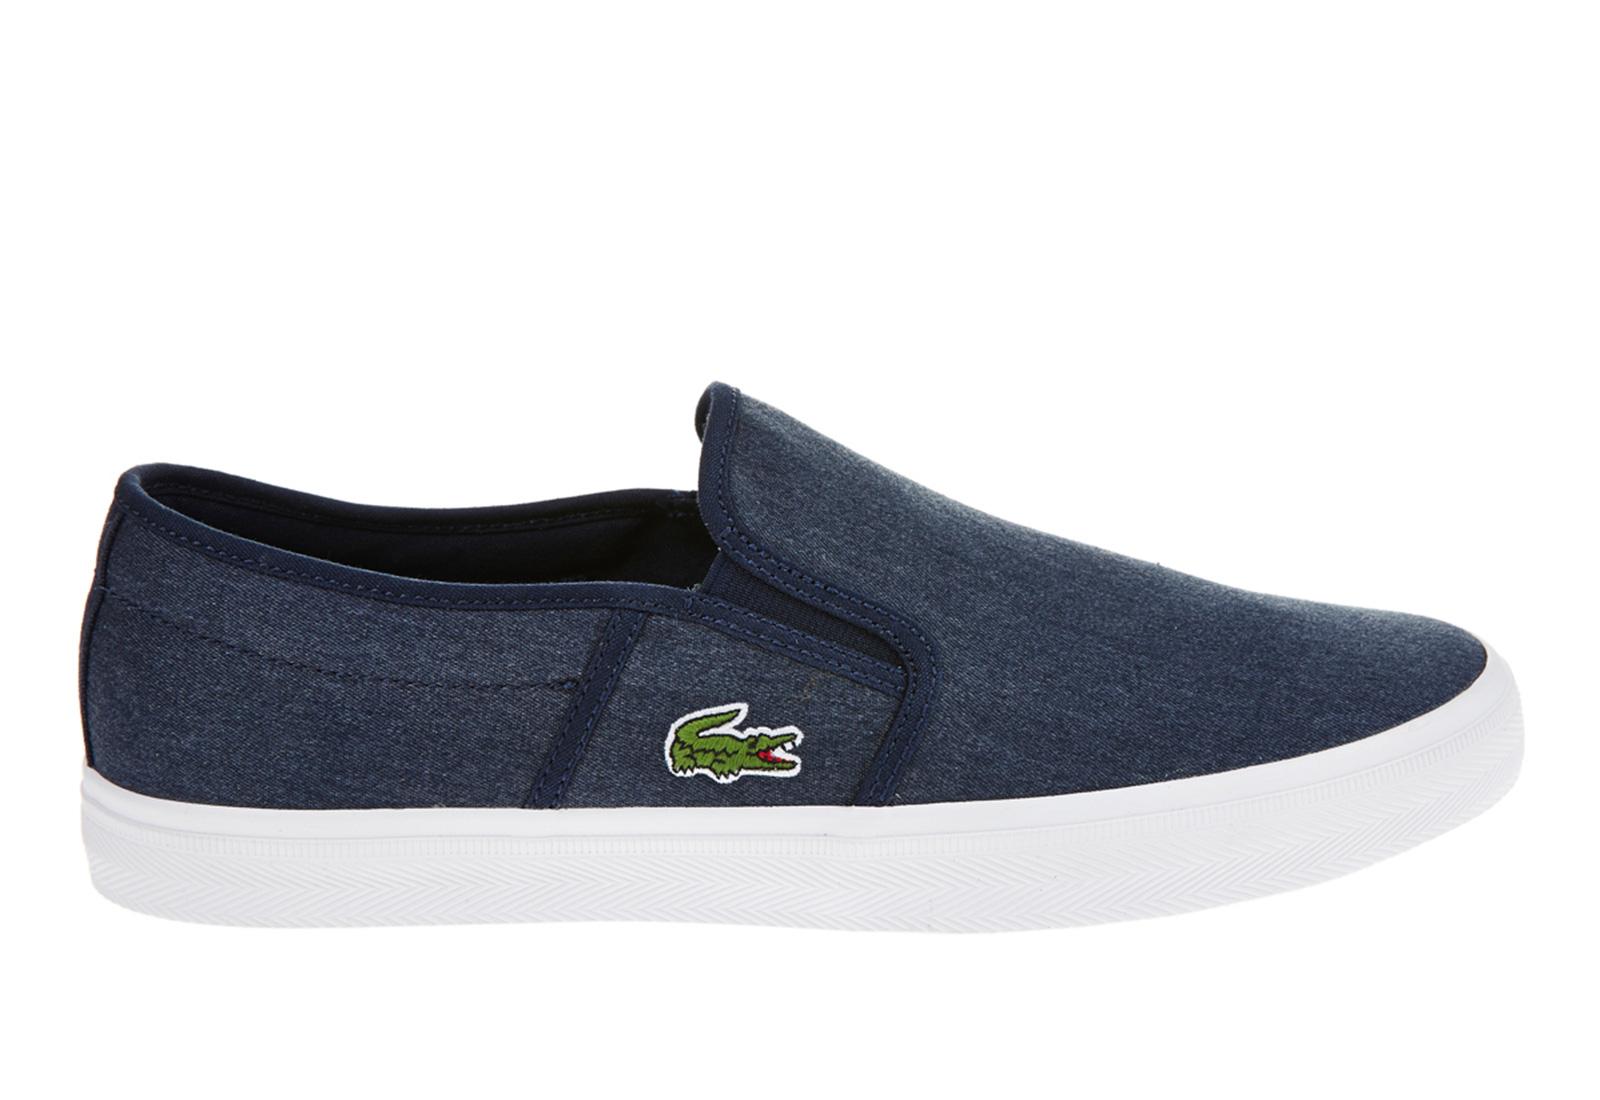 lacoste shoes gazon sport csu2 zx spm0023db4